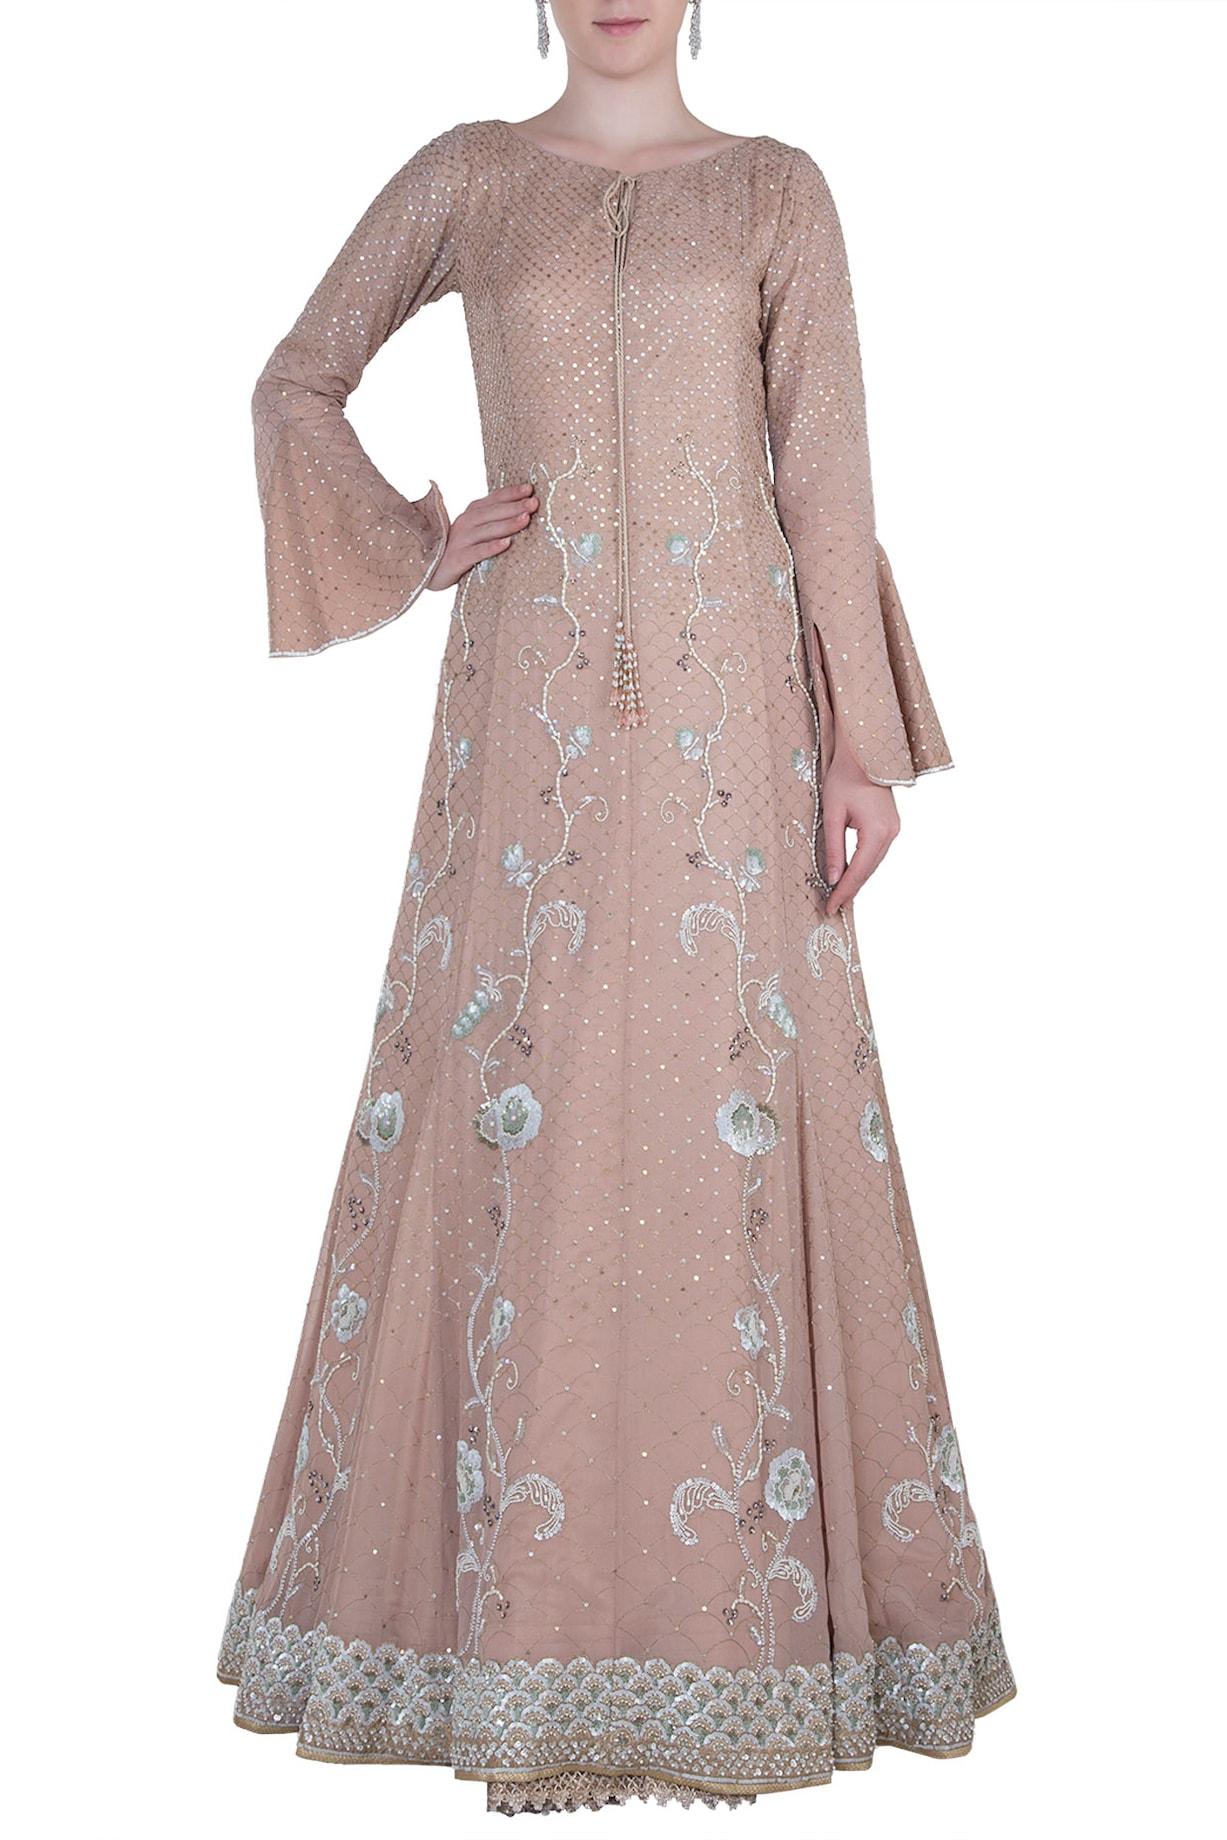 Kotwara by Meera and Muzaffar Ali Gowns